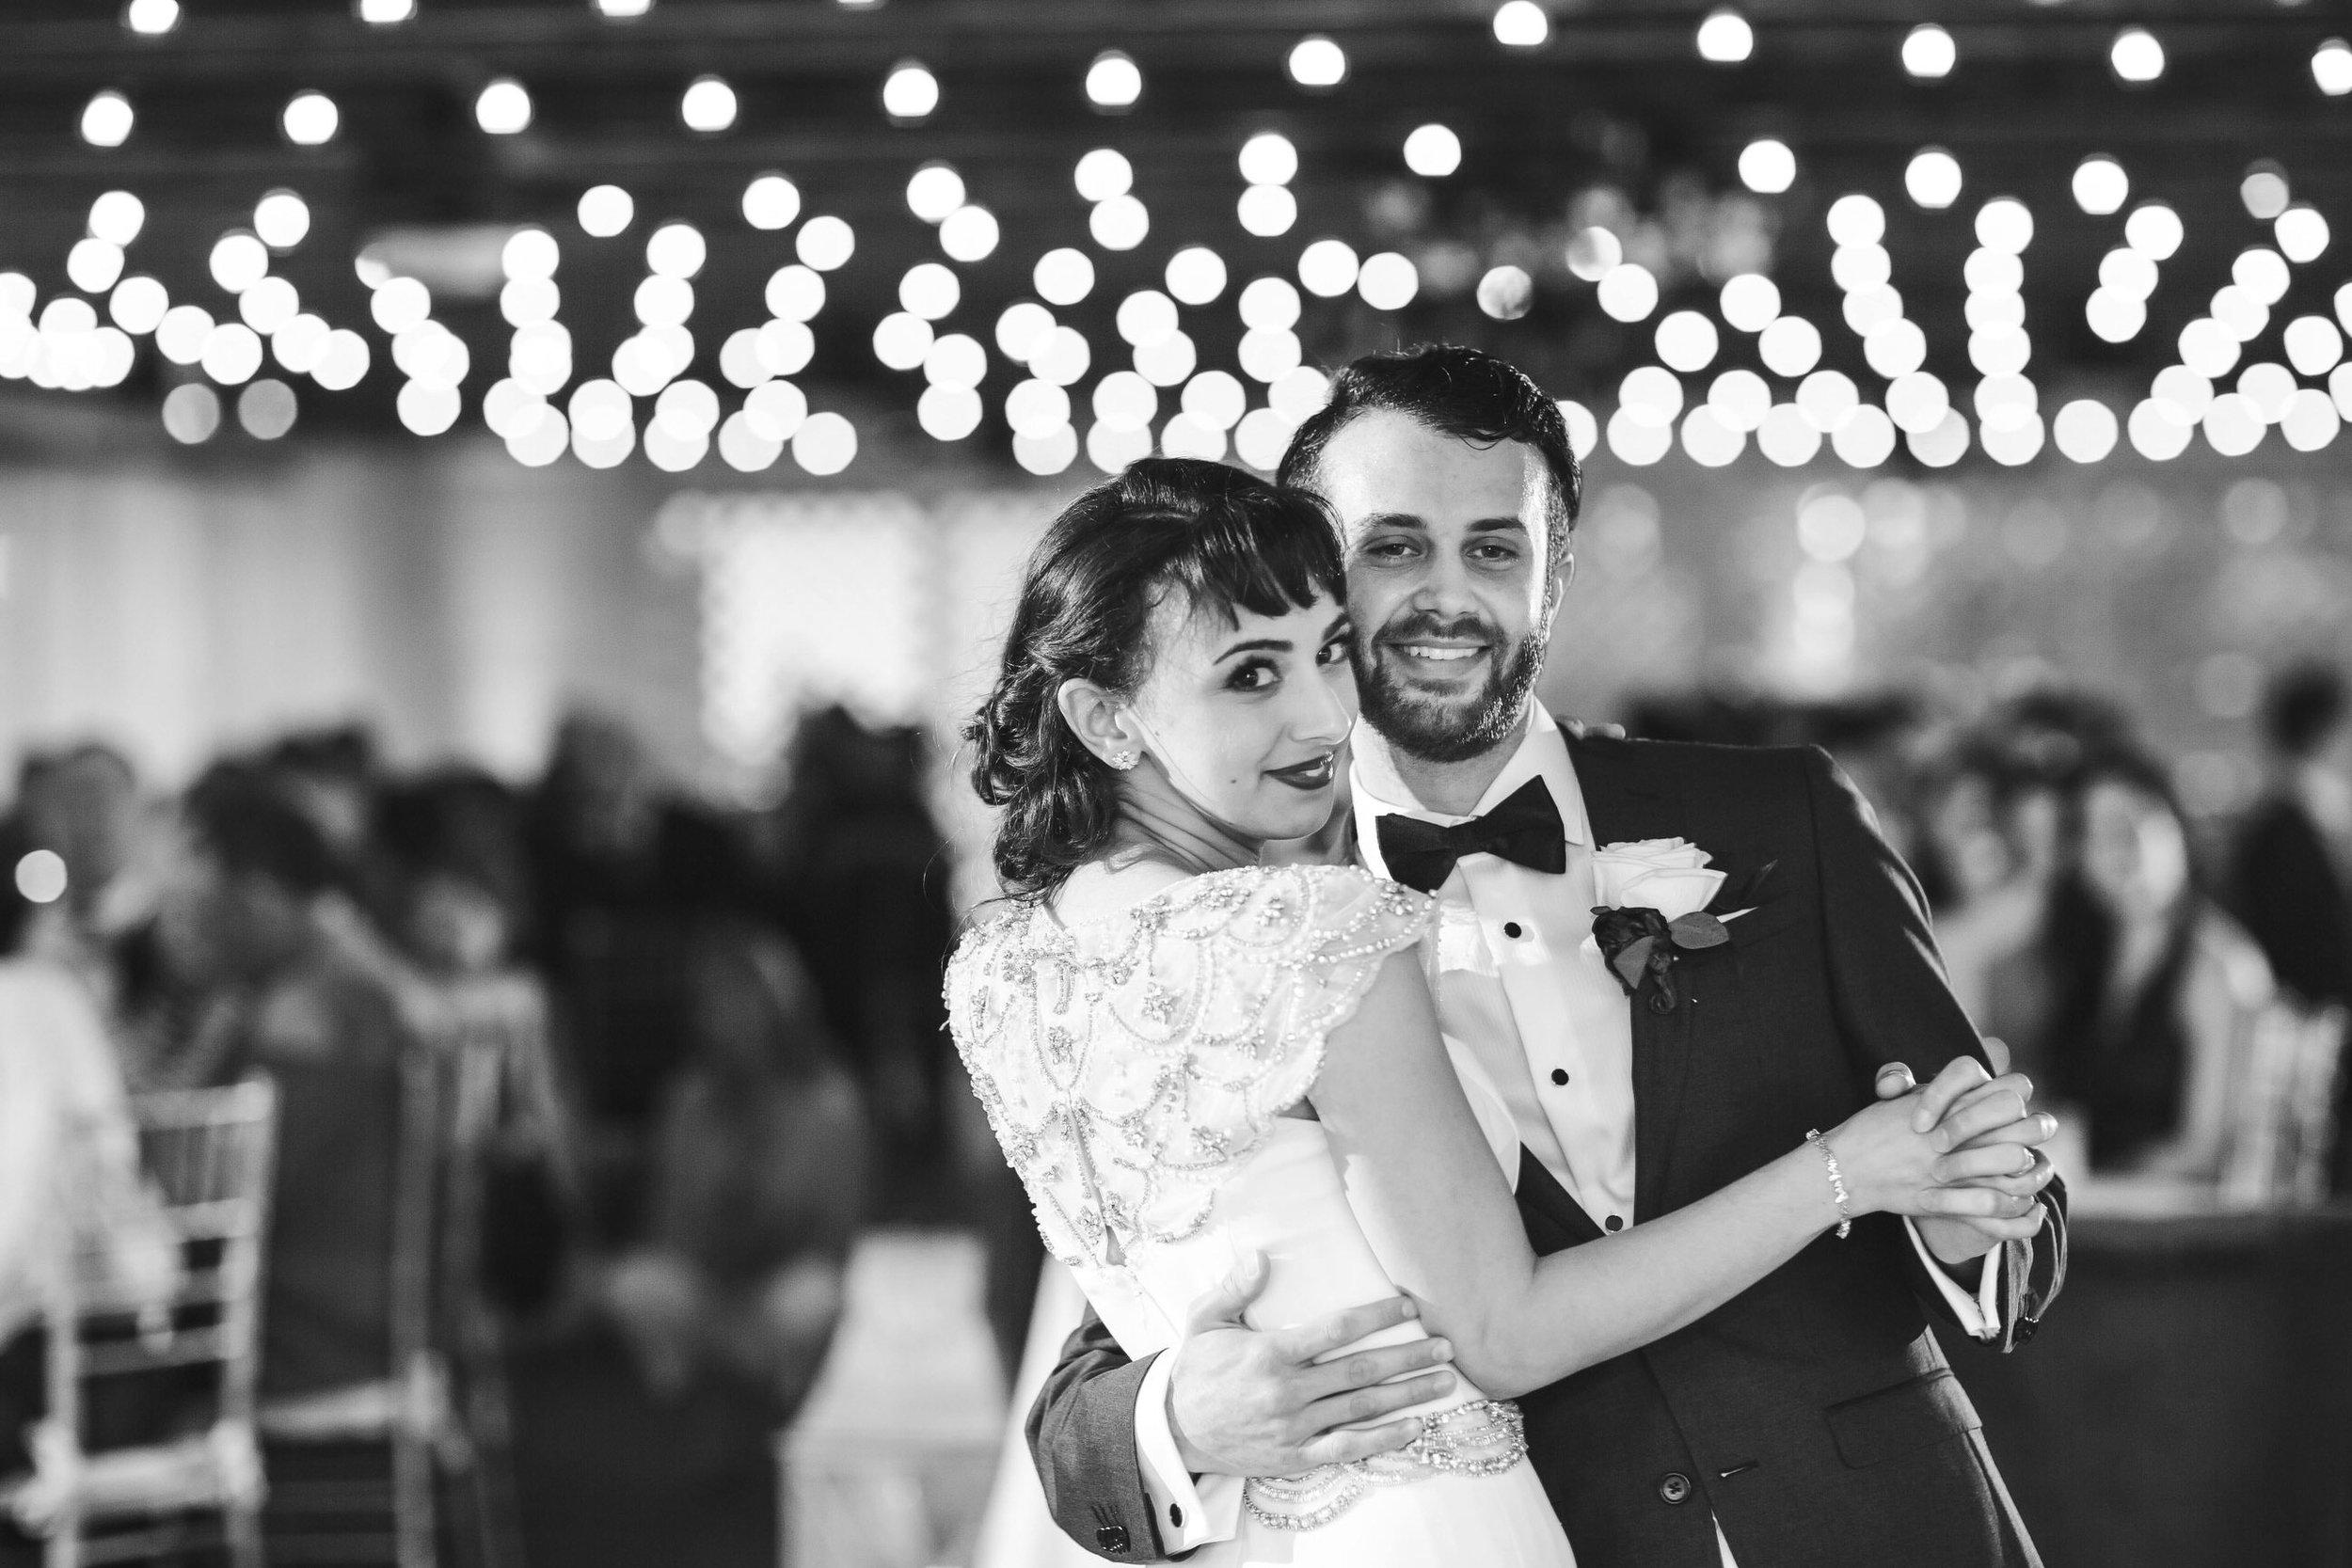 first-dance-beautiful-couple-wedding-photography-tiny-house-photo.jpg